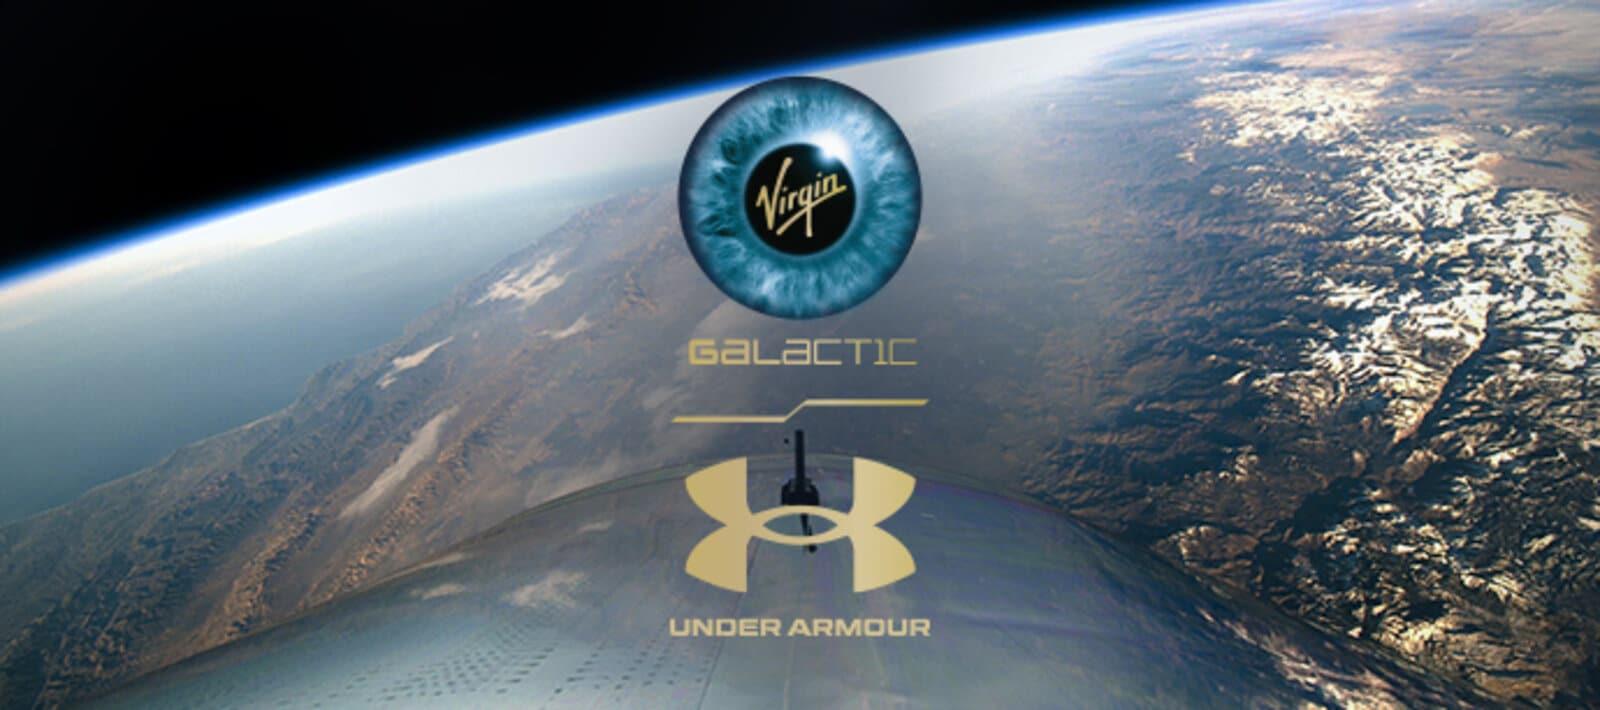 Virgin Galactic Spaceflight